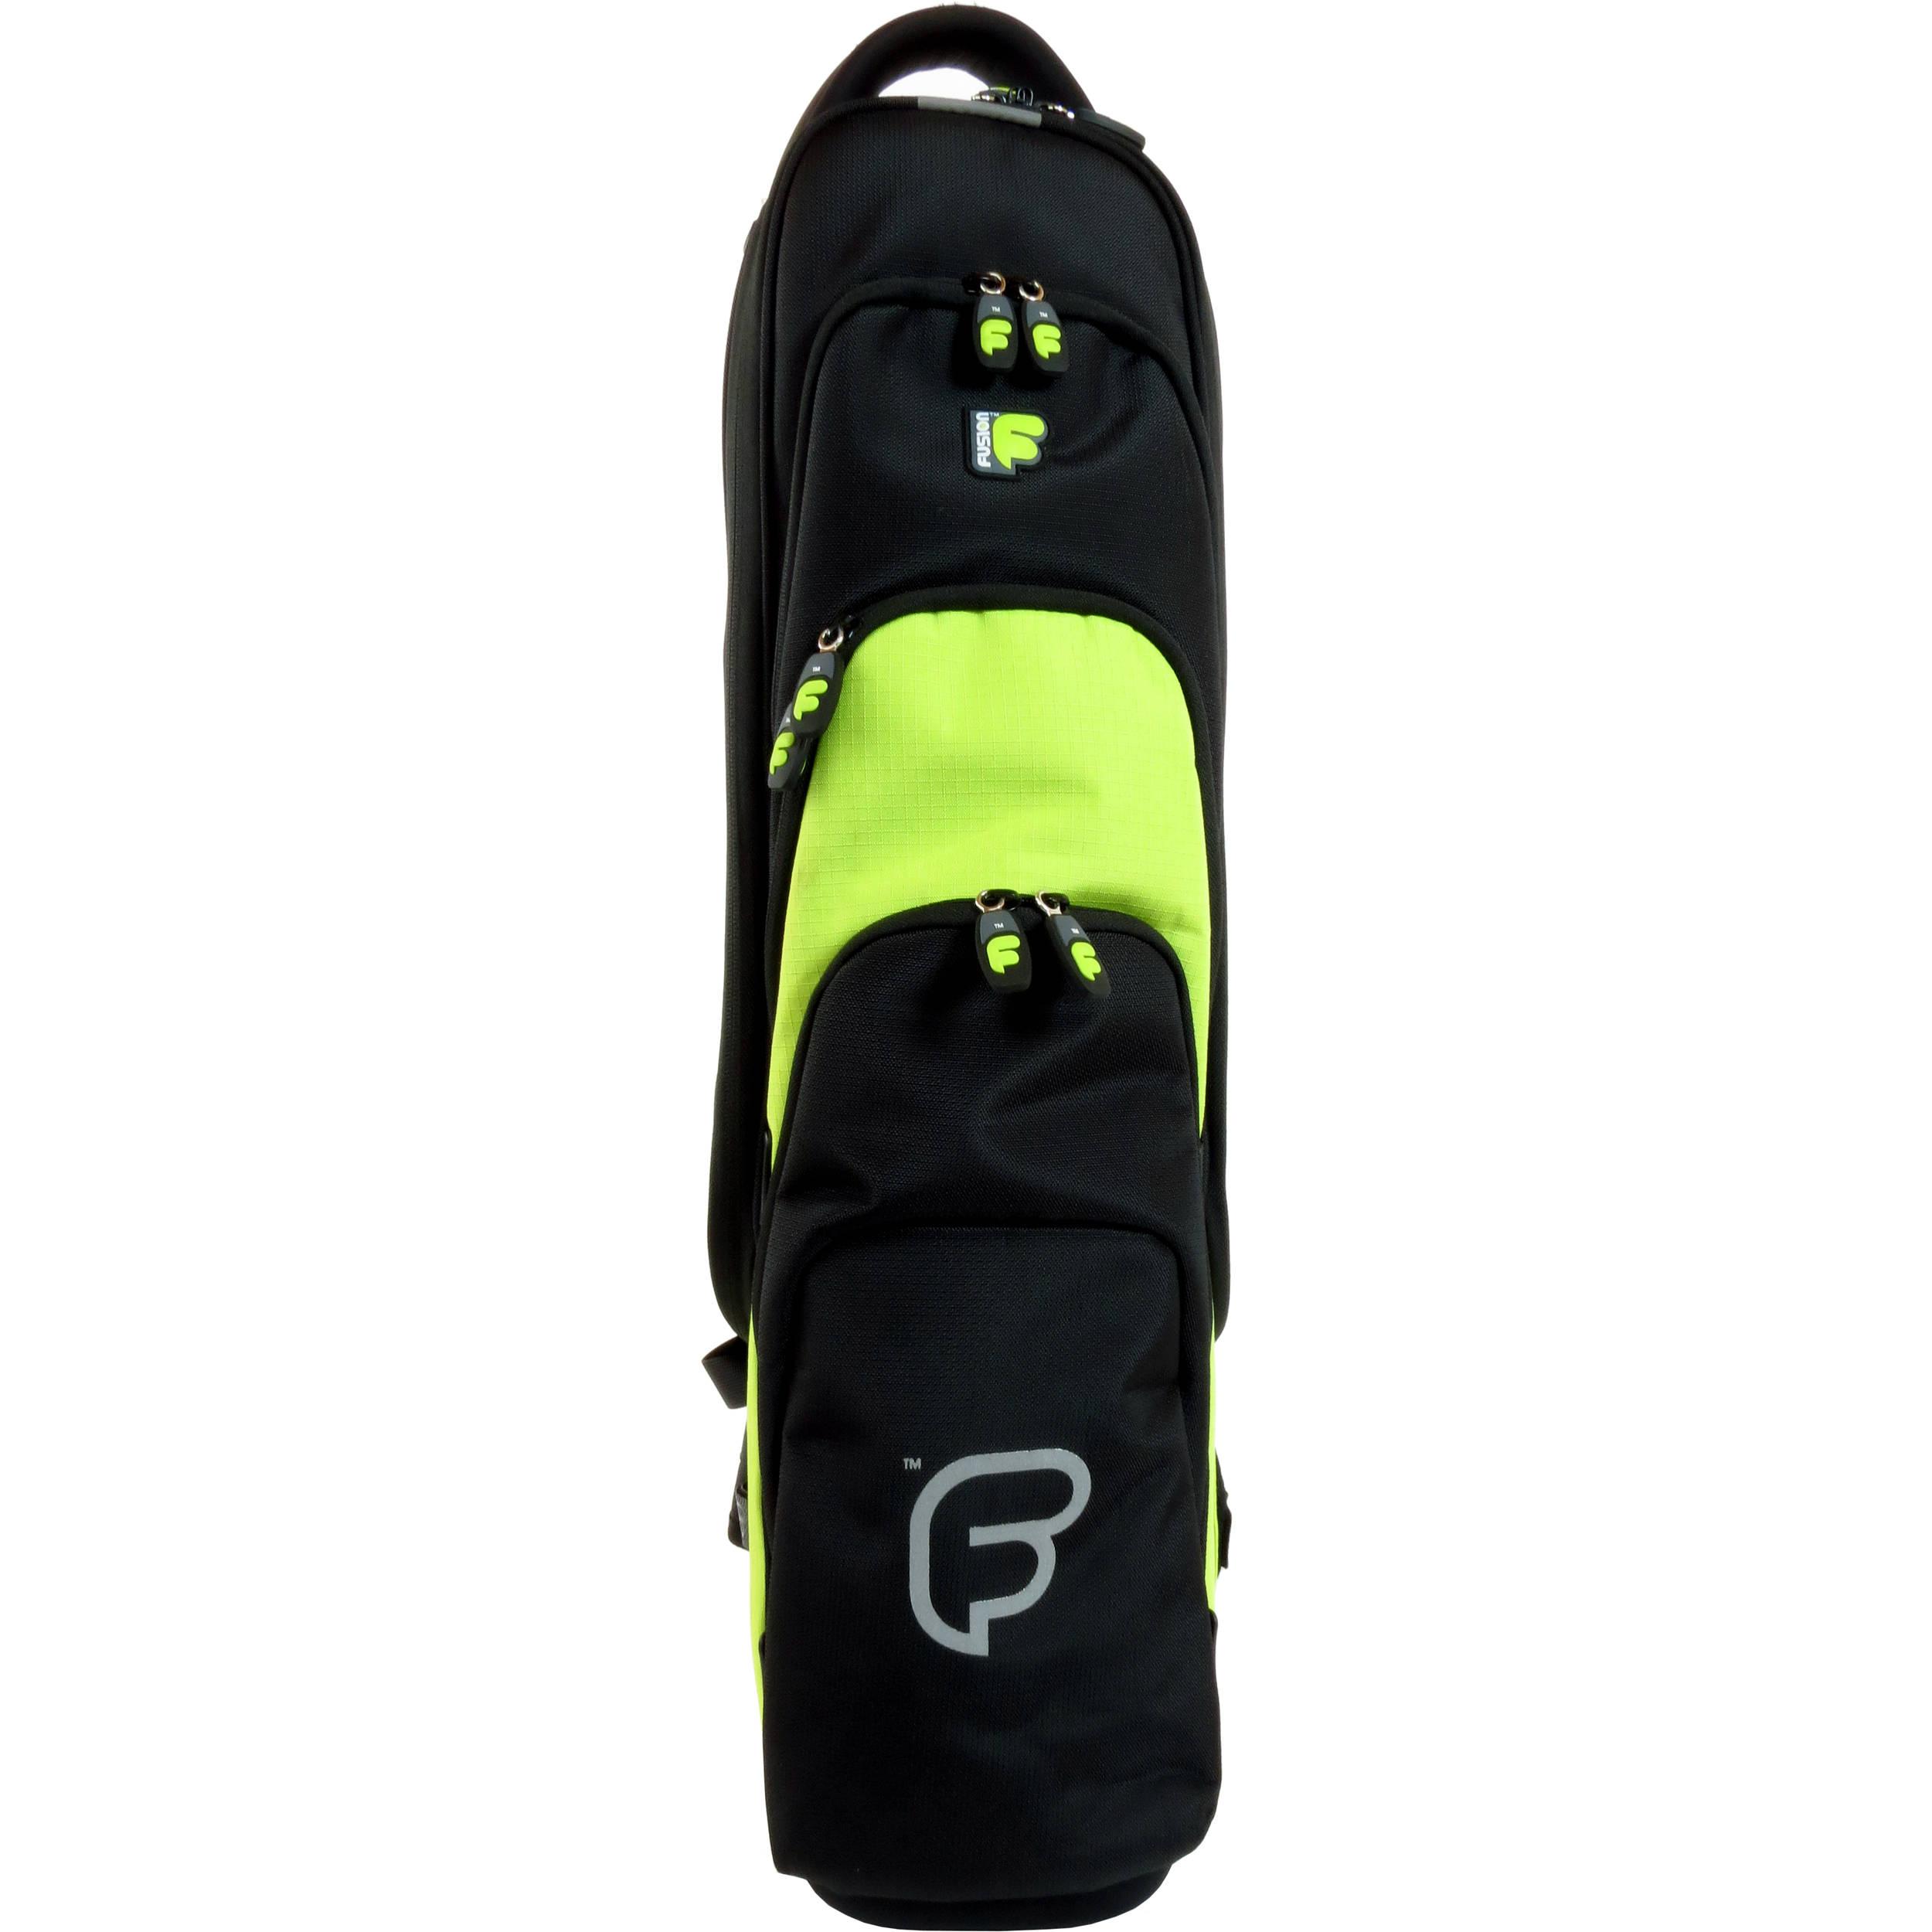 Fusion-Bags Premium Soprano Saxophone / Clarinet / Flute Gig Bag (Black /Lime)